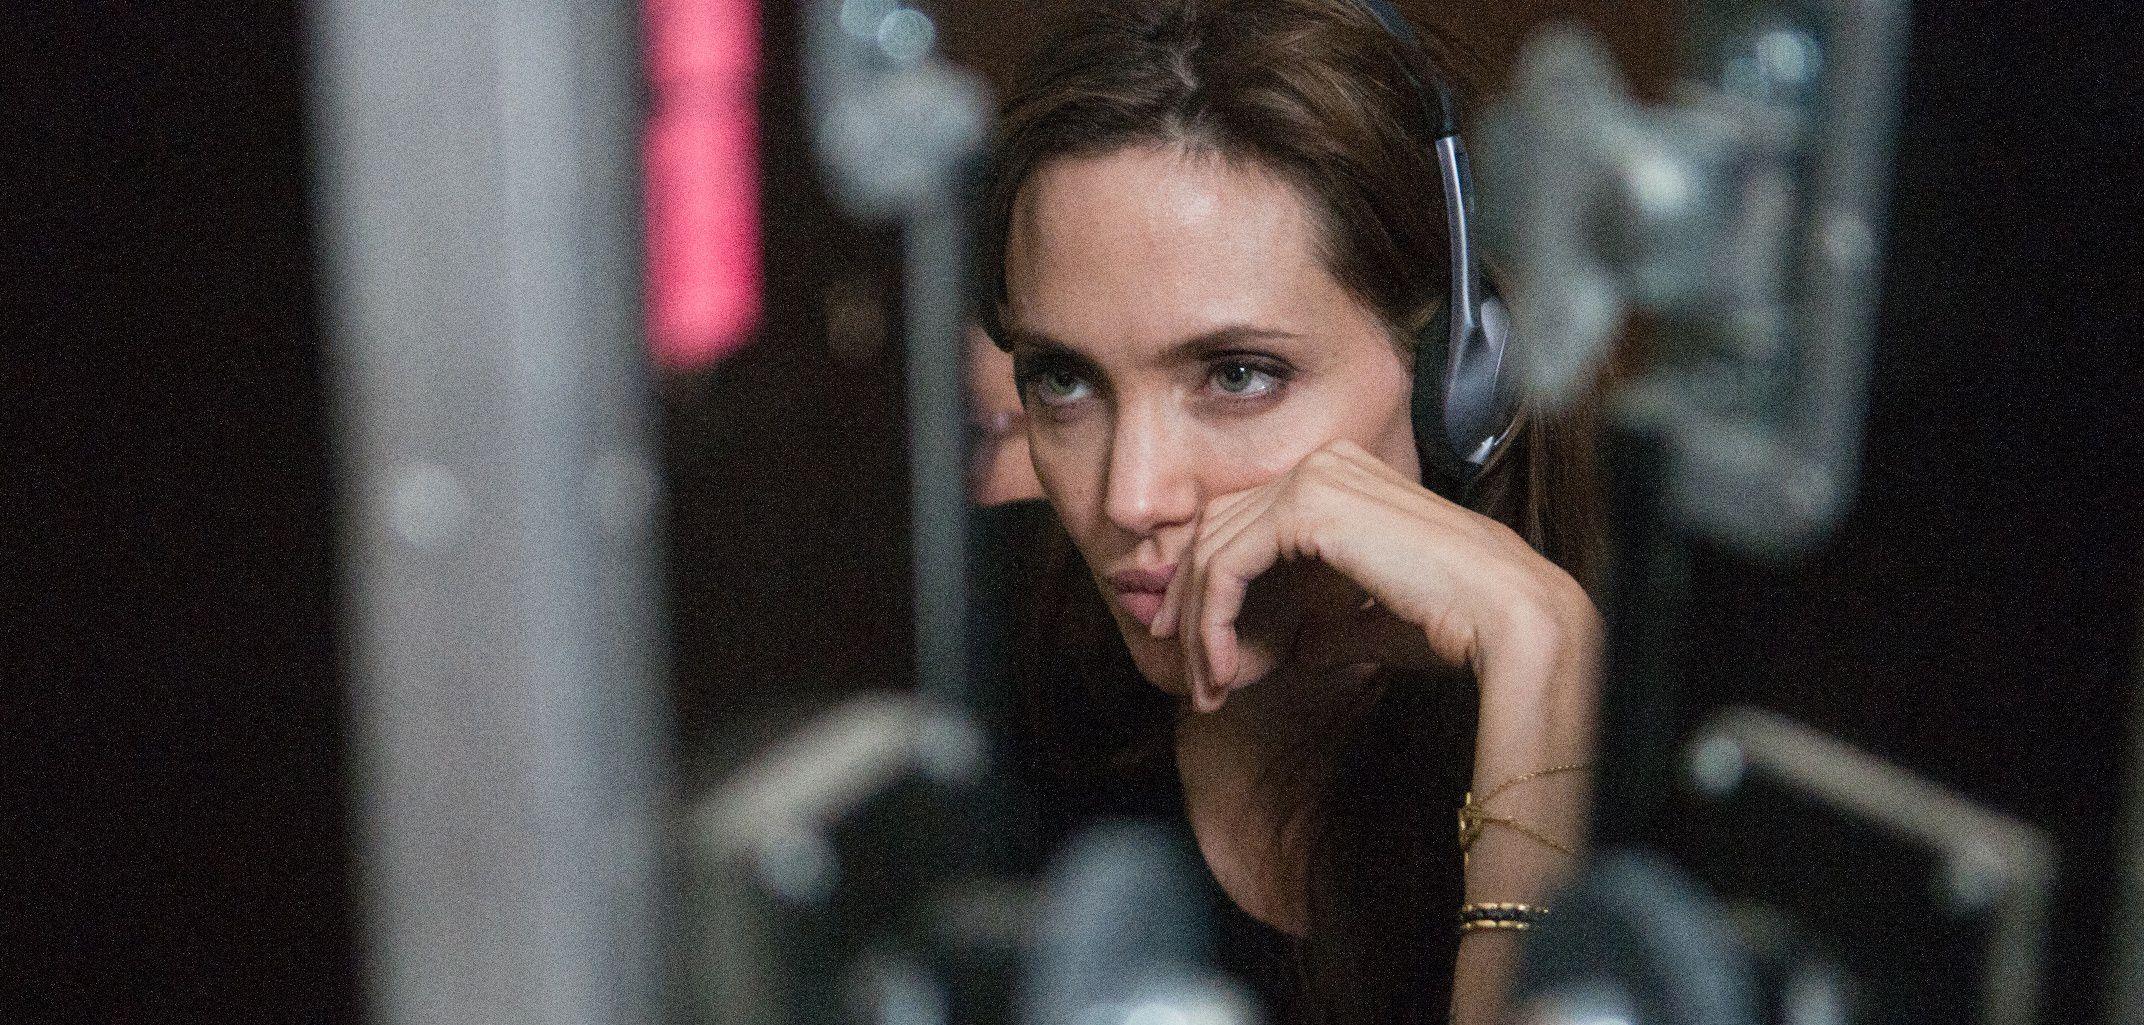 Angelina jolie nackt handy photos